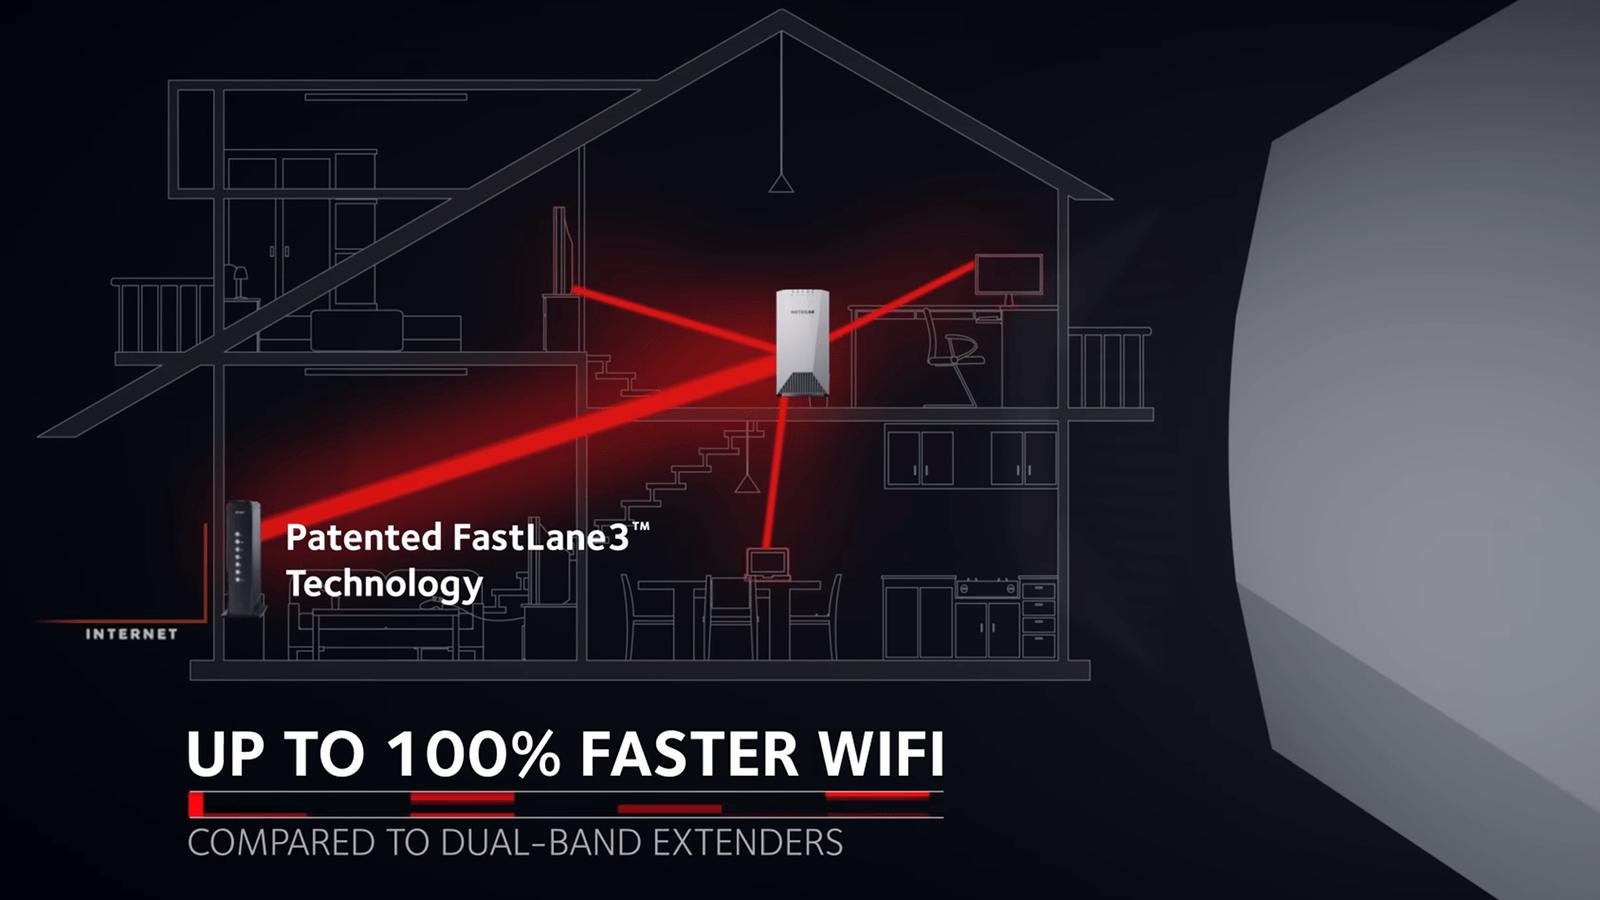 NETGEAR 續推「類」Mesh Wi-Fi 新品,Nighthawk X4S(EX7500)三頻延伸訊號不掉速 ...